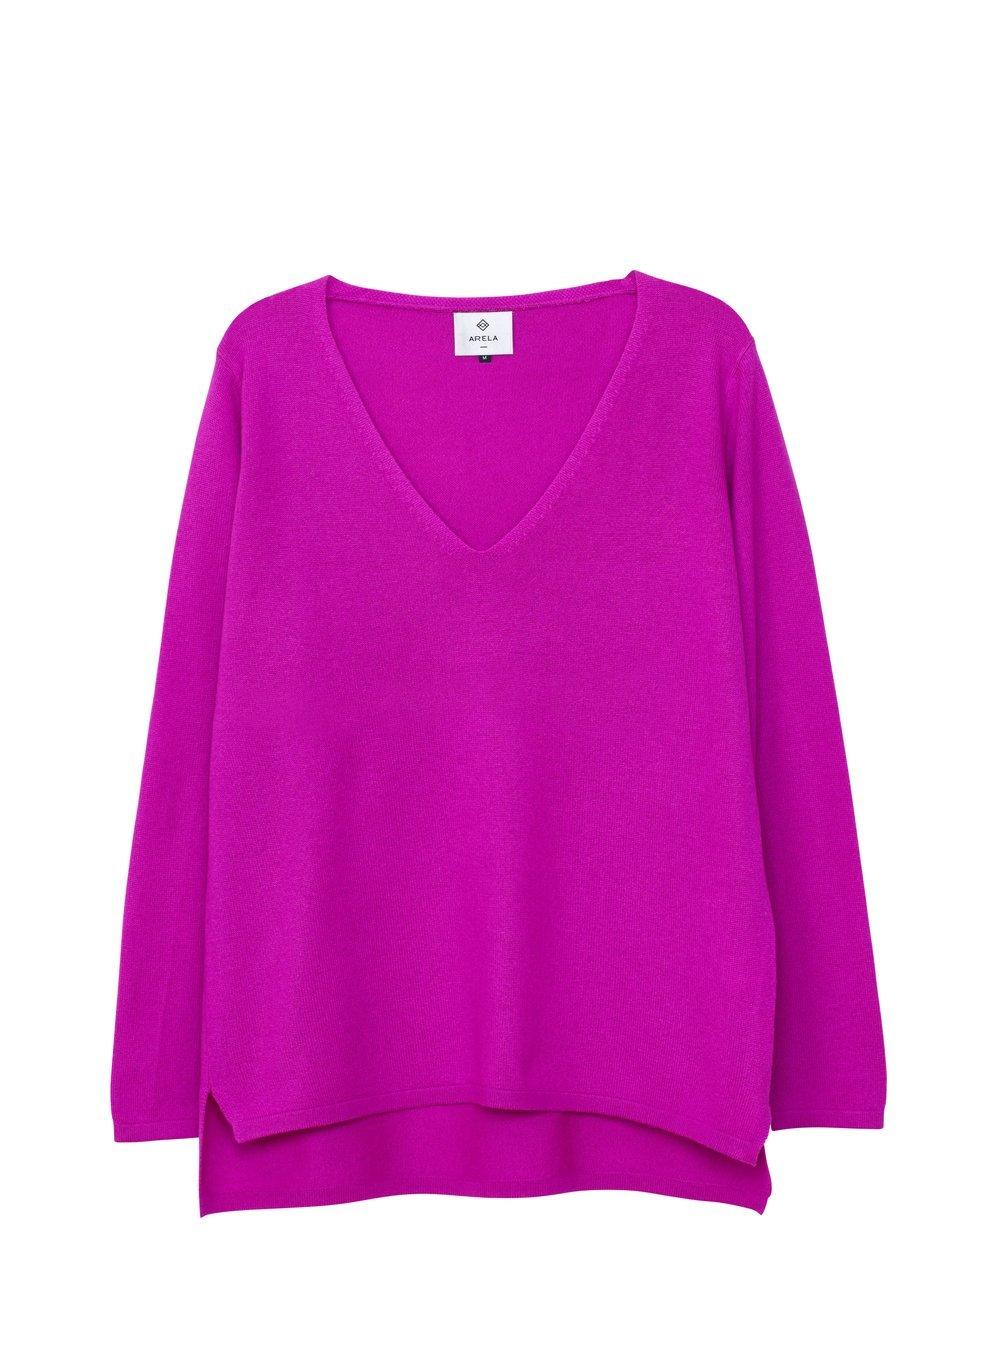 ARELA Vija Cashmere Sweater In Bright Pink